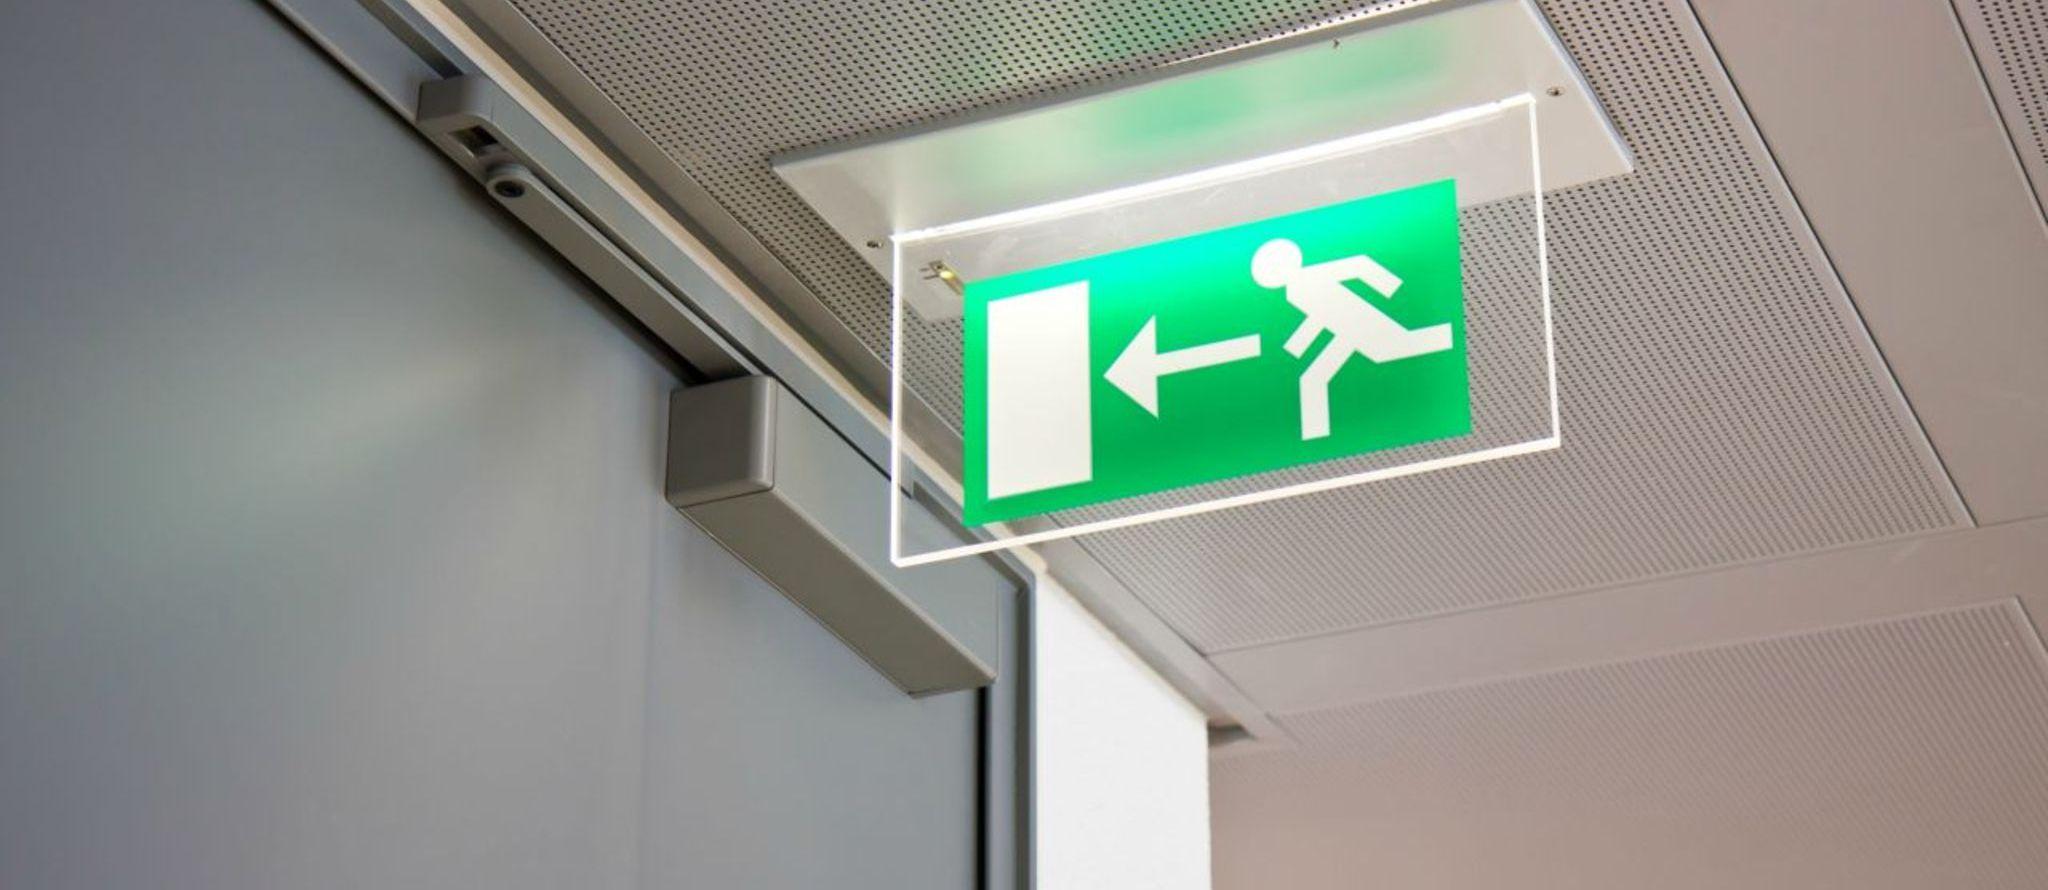 LED verlichting voor noodverlichting verplicht vanaf 1 juli 2020